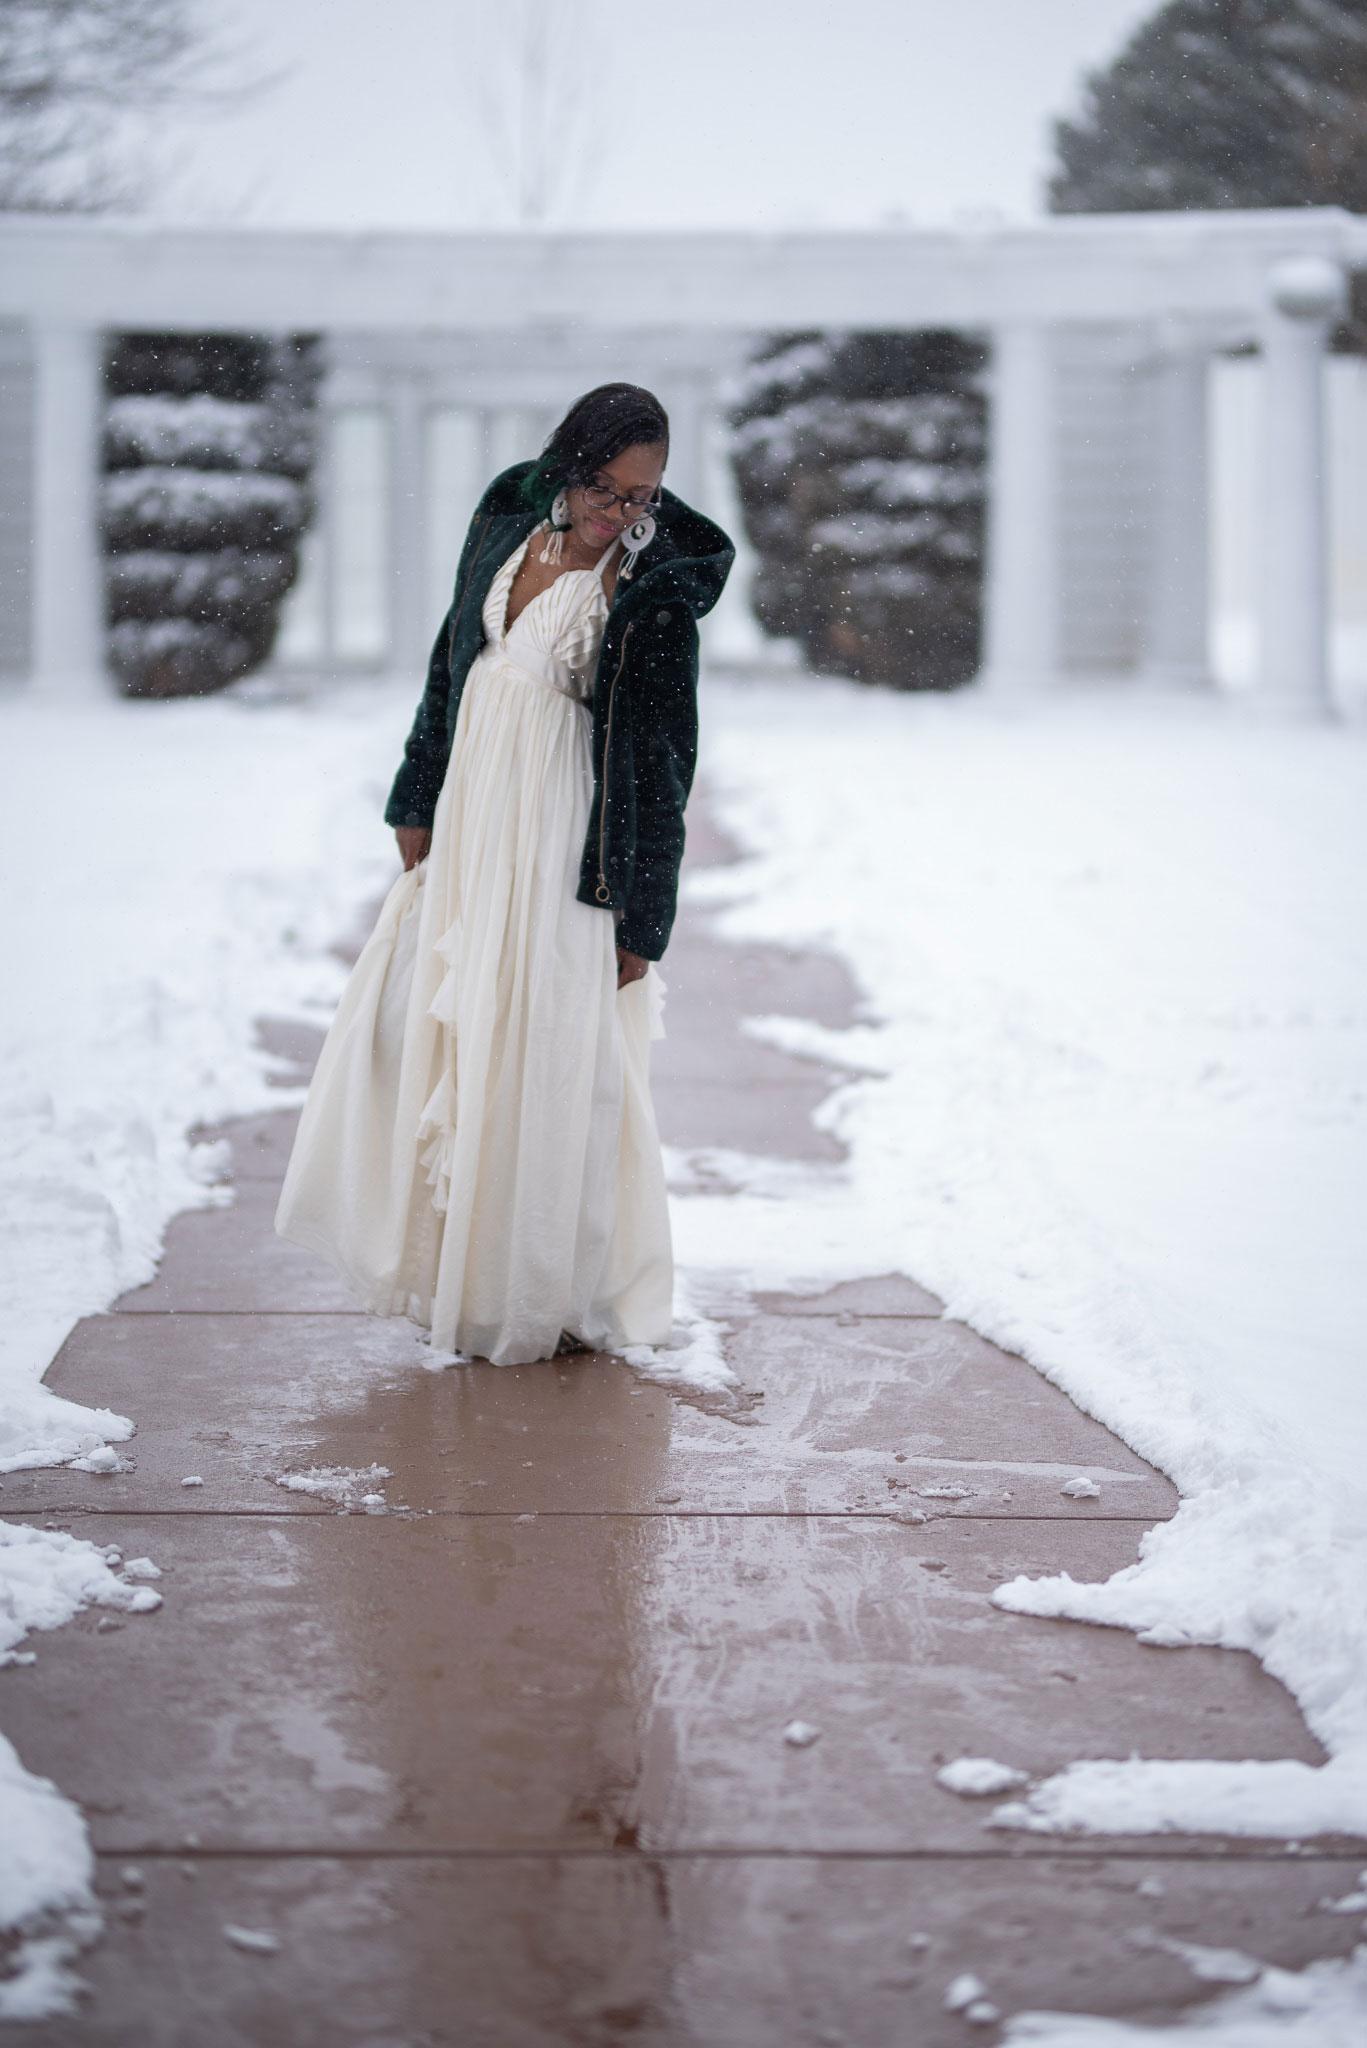 Bridal model in wedding dress in the snow at the Cannabis Wedding Expo in Denver, Colorado. Photo by Kenesha Facello.